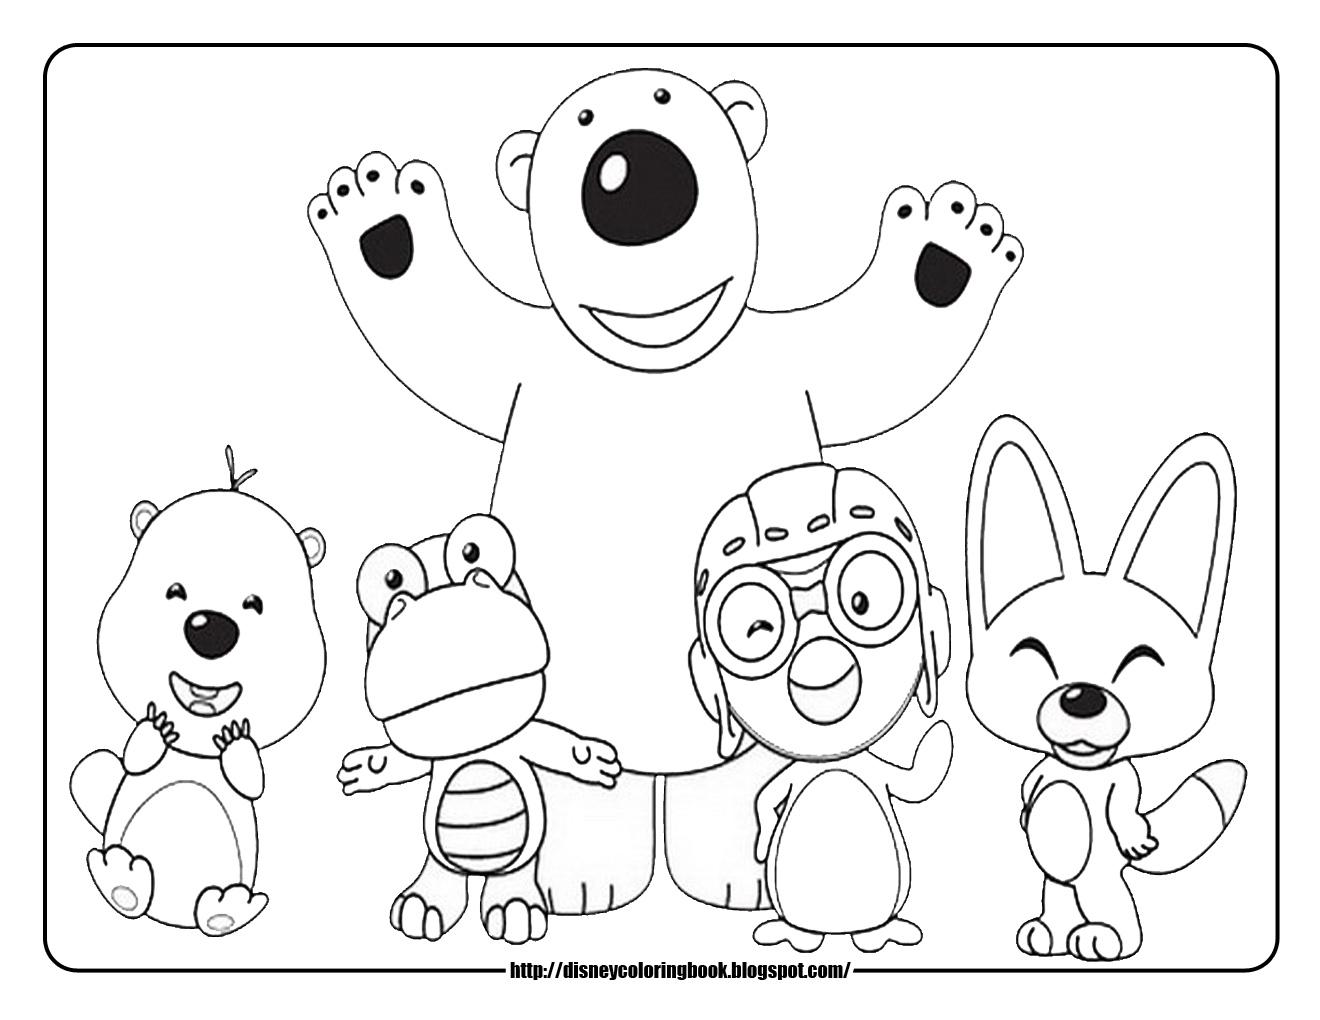 Pororo The Little Penguin Free Disney Coloring Sheets